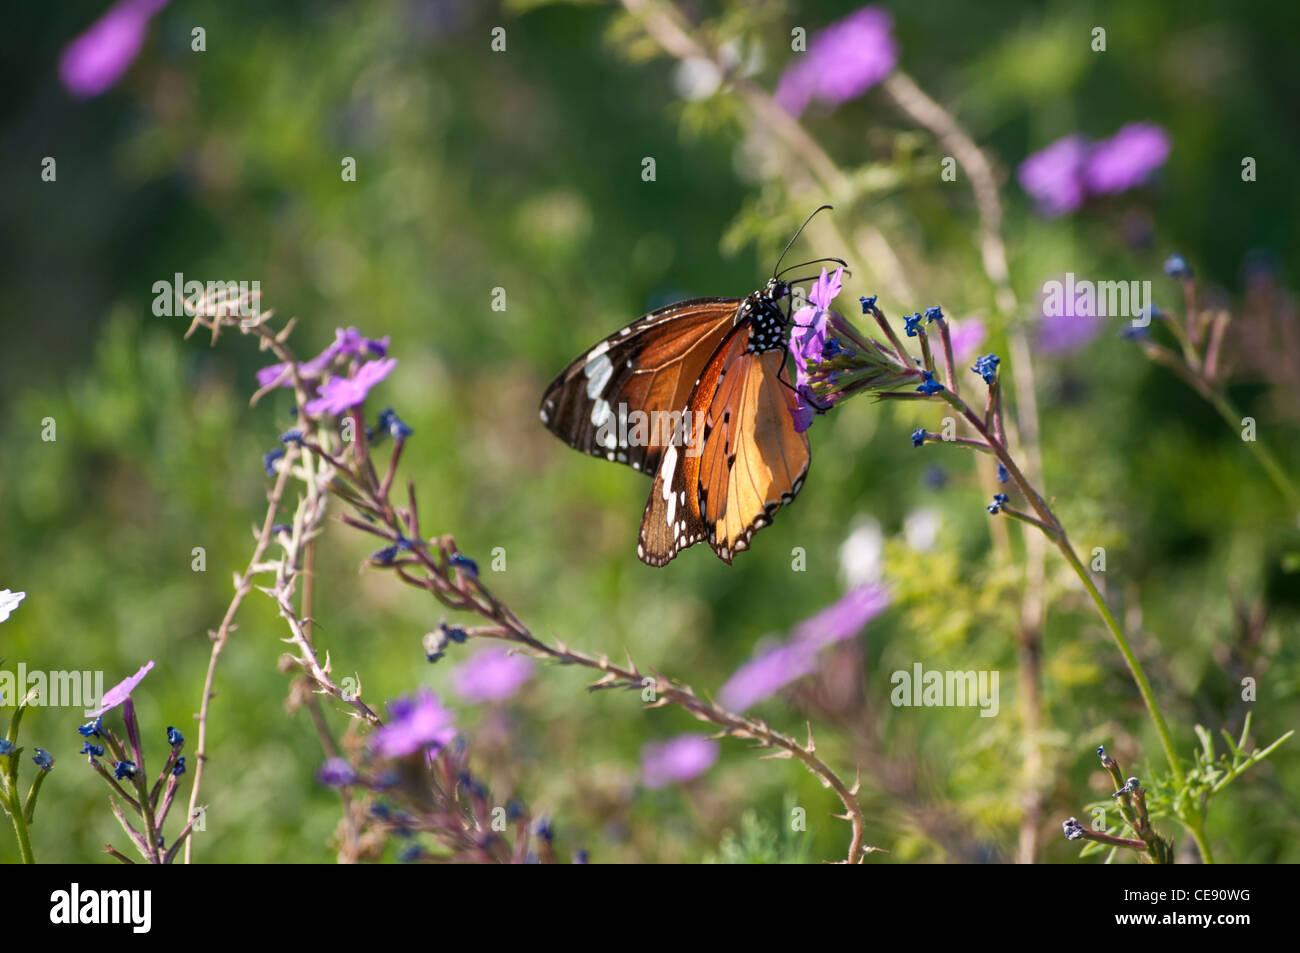 Monarch butterfly, Danaus plexippus, feeding on a purple flower, Rishikesh, Uttarakhand, India - Stock Image